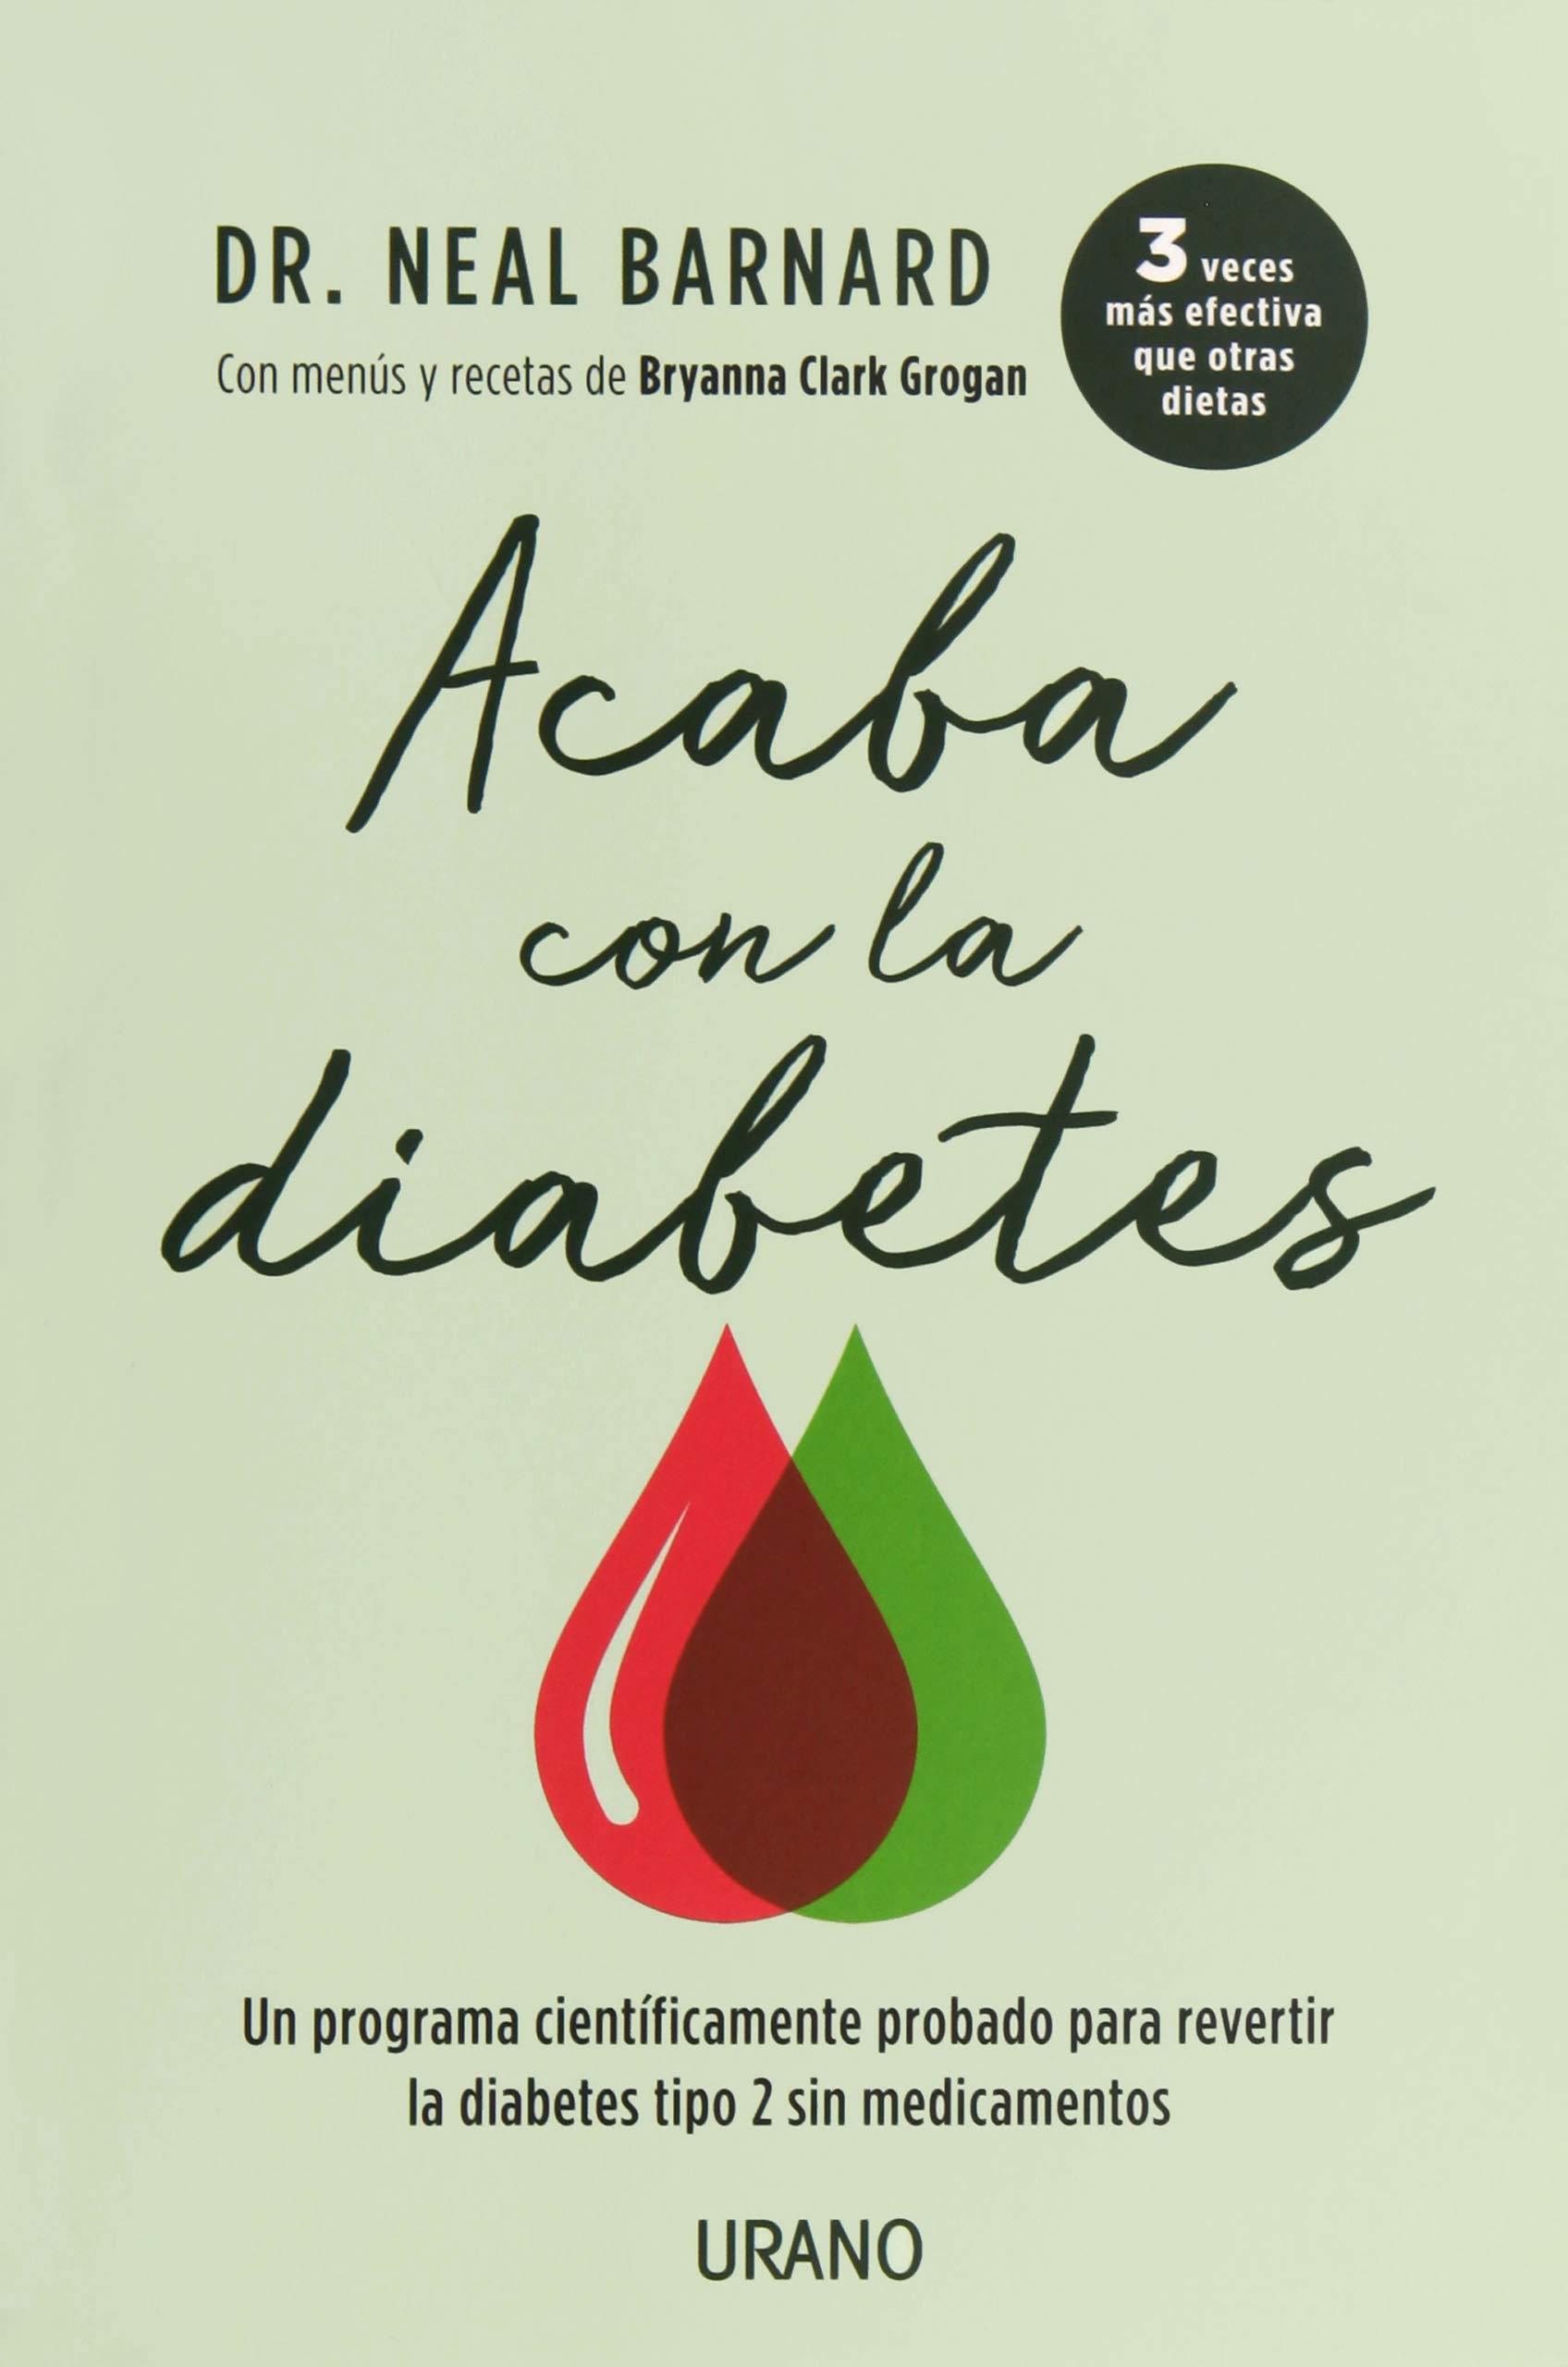 dieta clarke 2020 para la diabetes